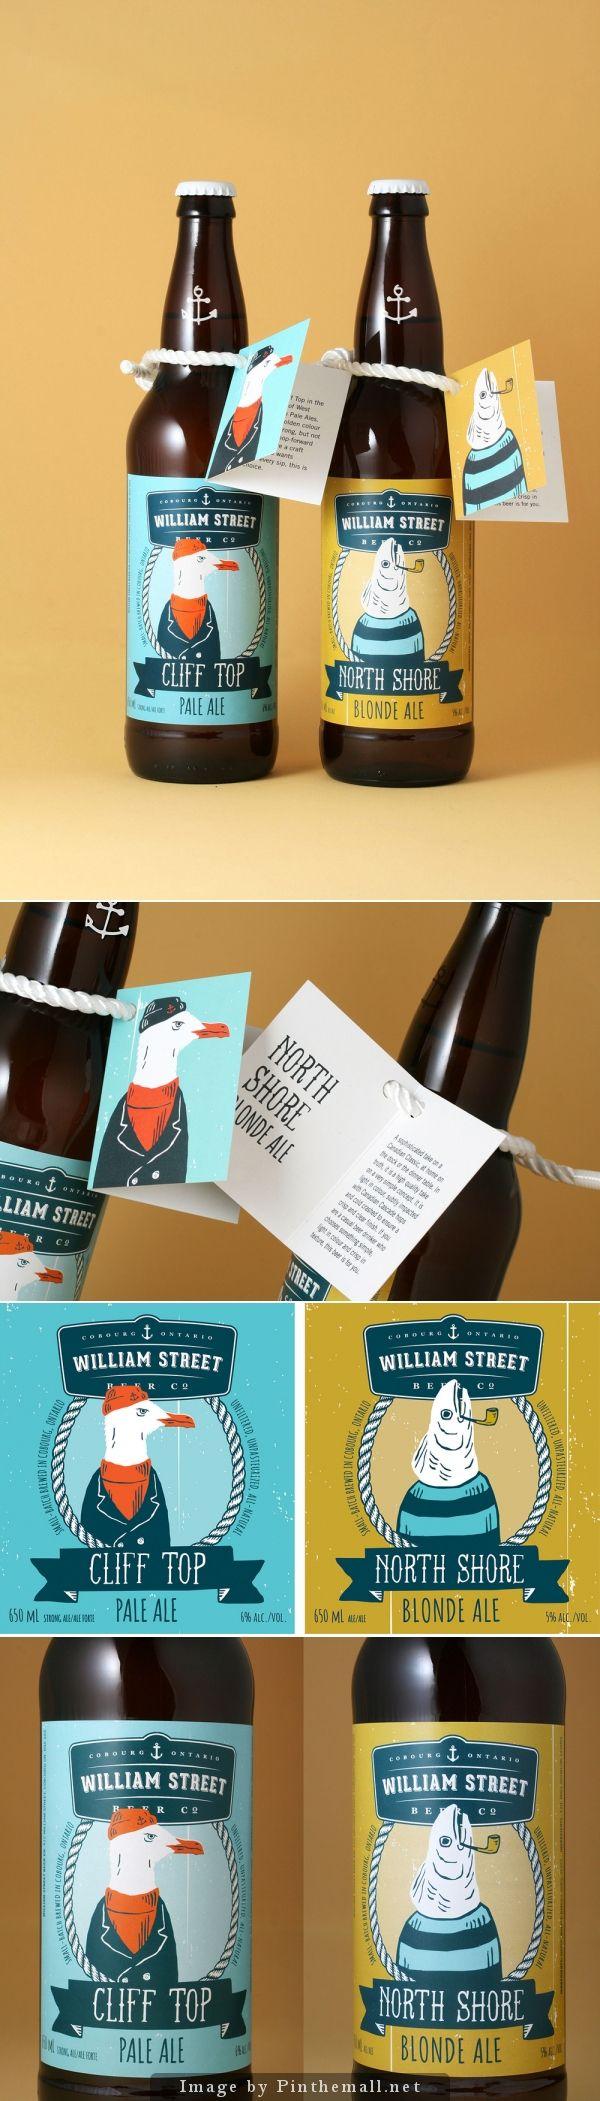 William Street Beer Co. #label #design | by Luke Despatie  The Design Firm